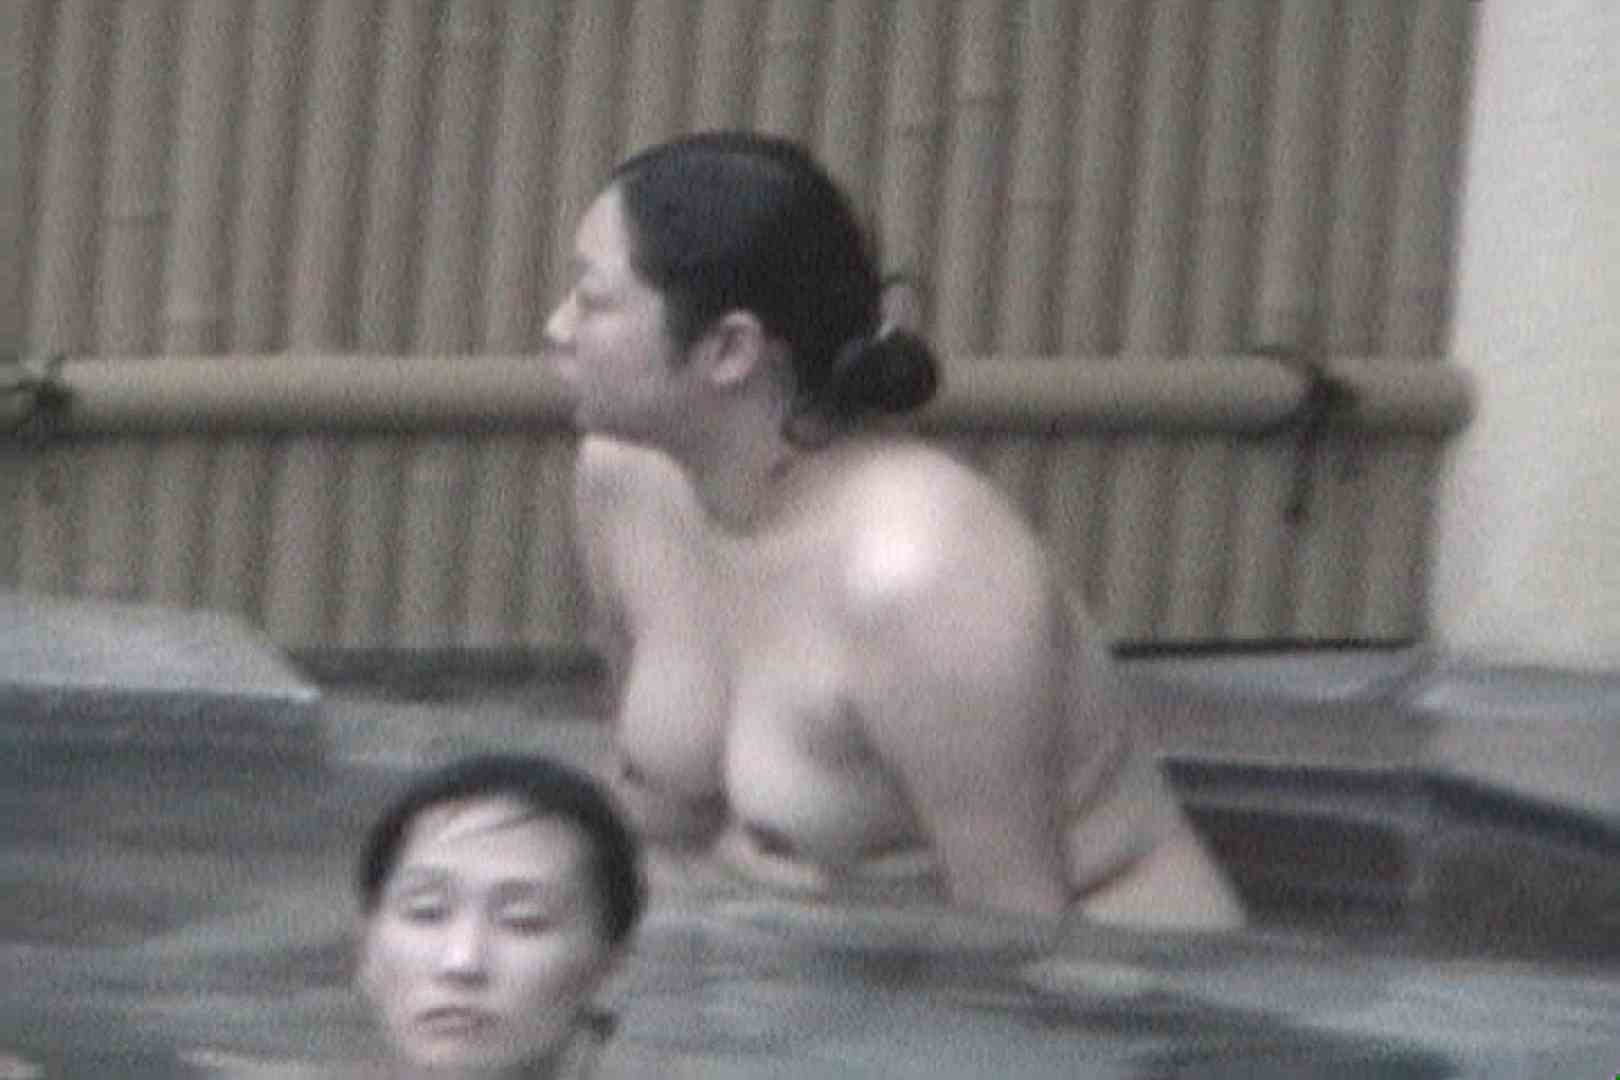 Aquaな露天風呂Vol.557 露天 われめAV動画紹介 78枚 23